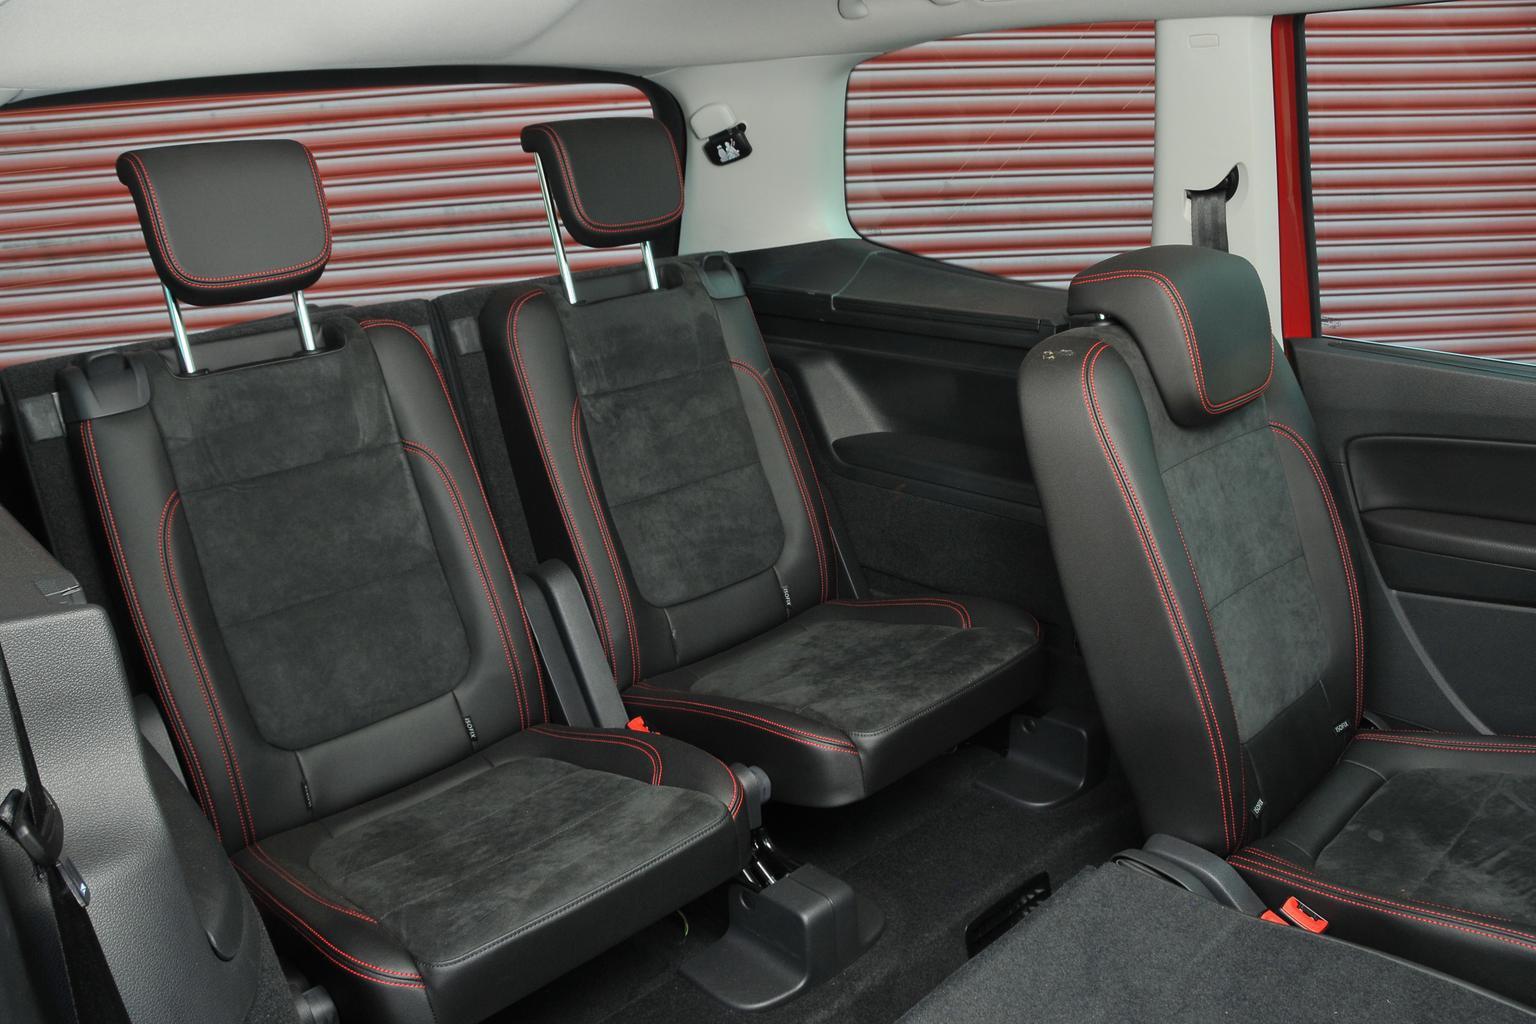 Used Seat Alhambra 11-present